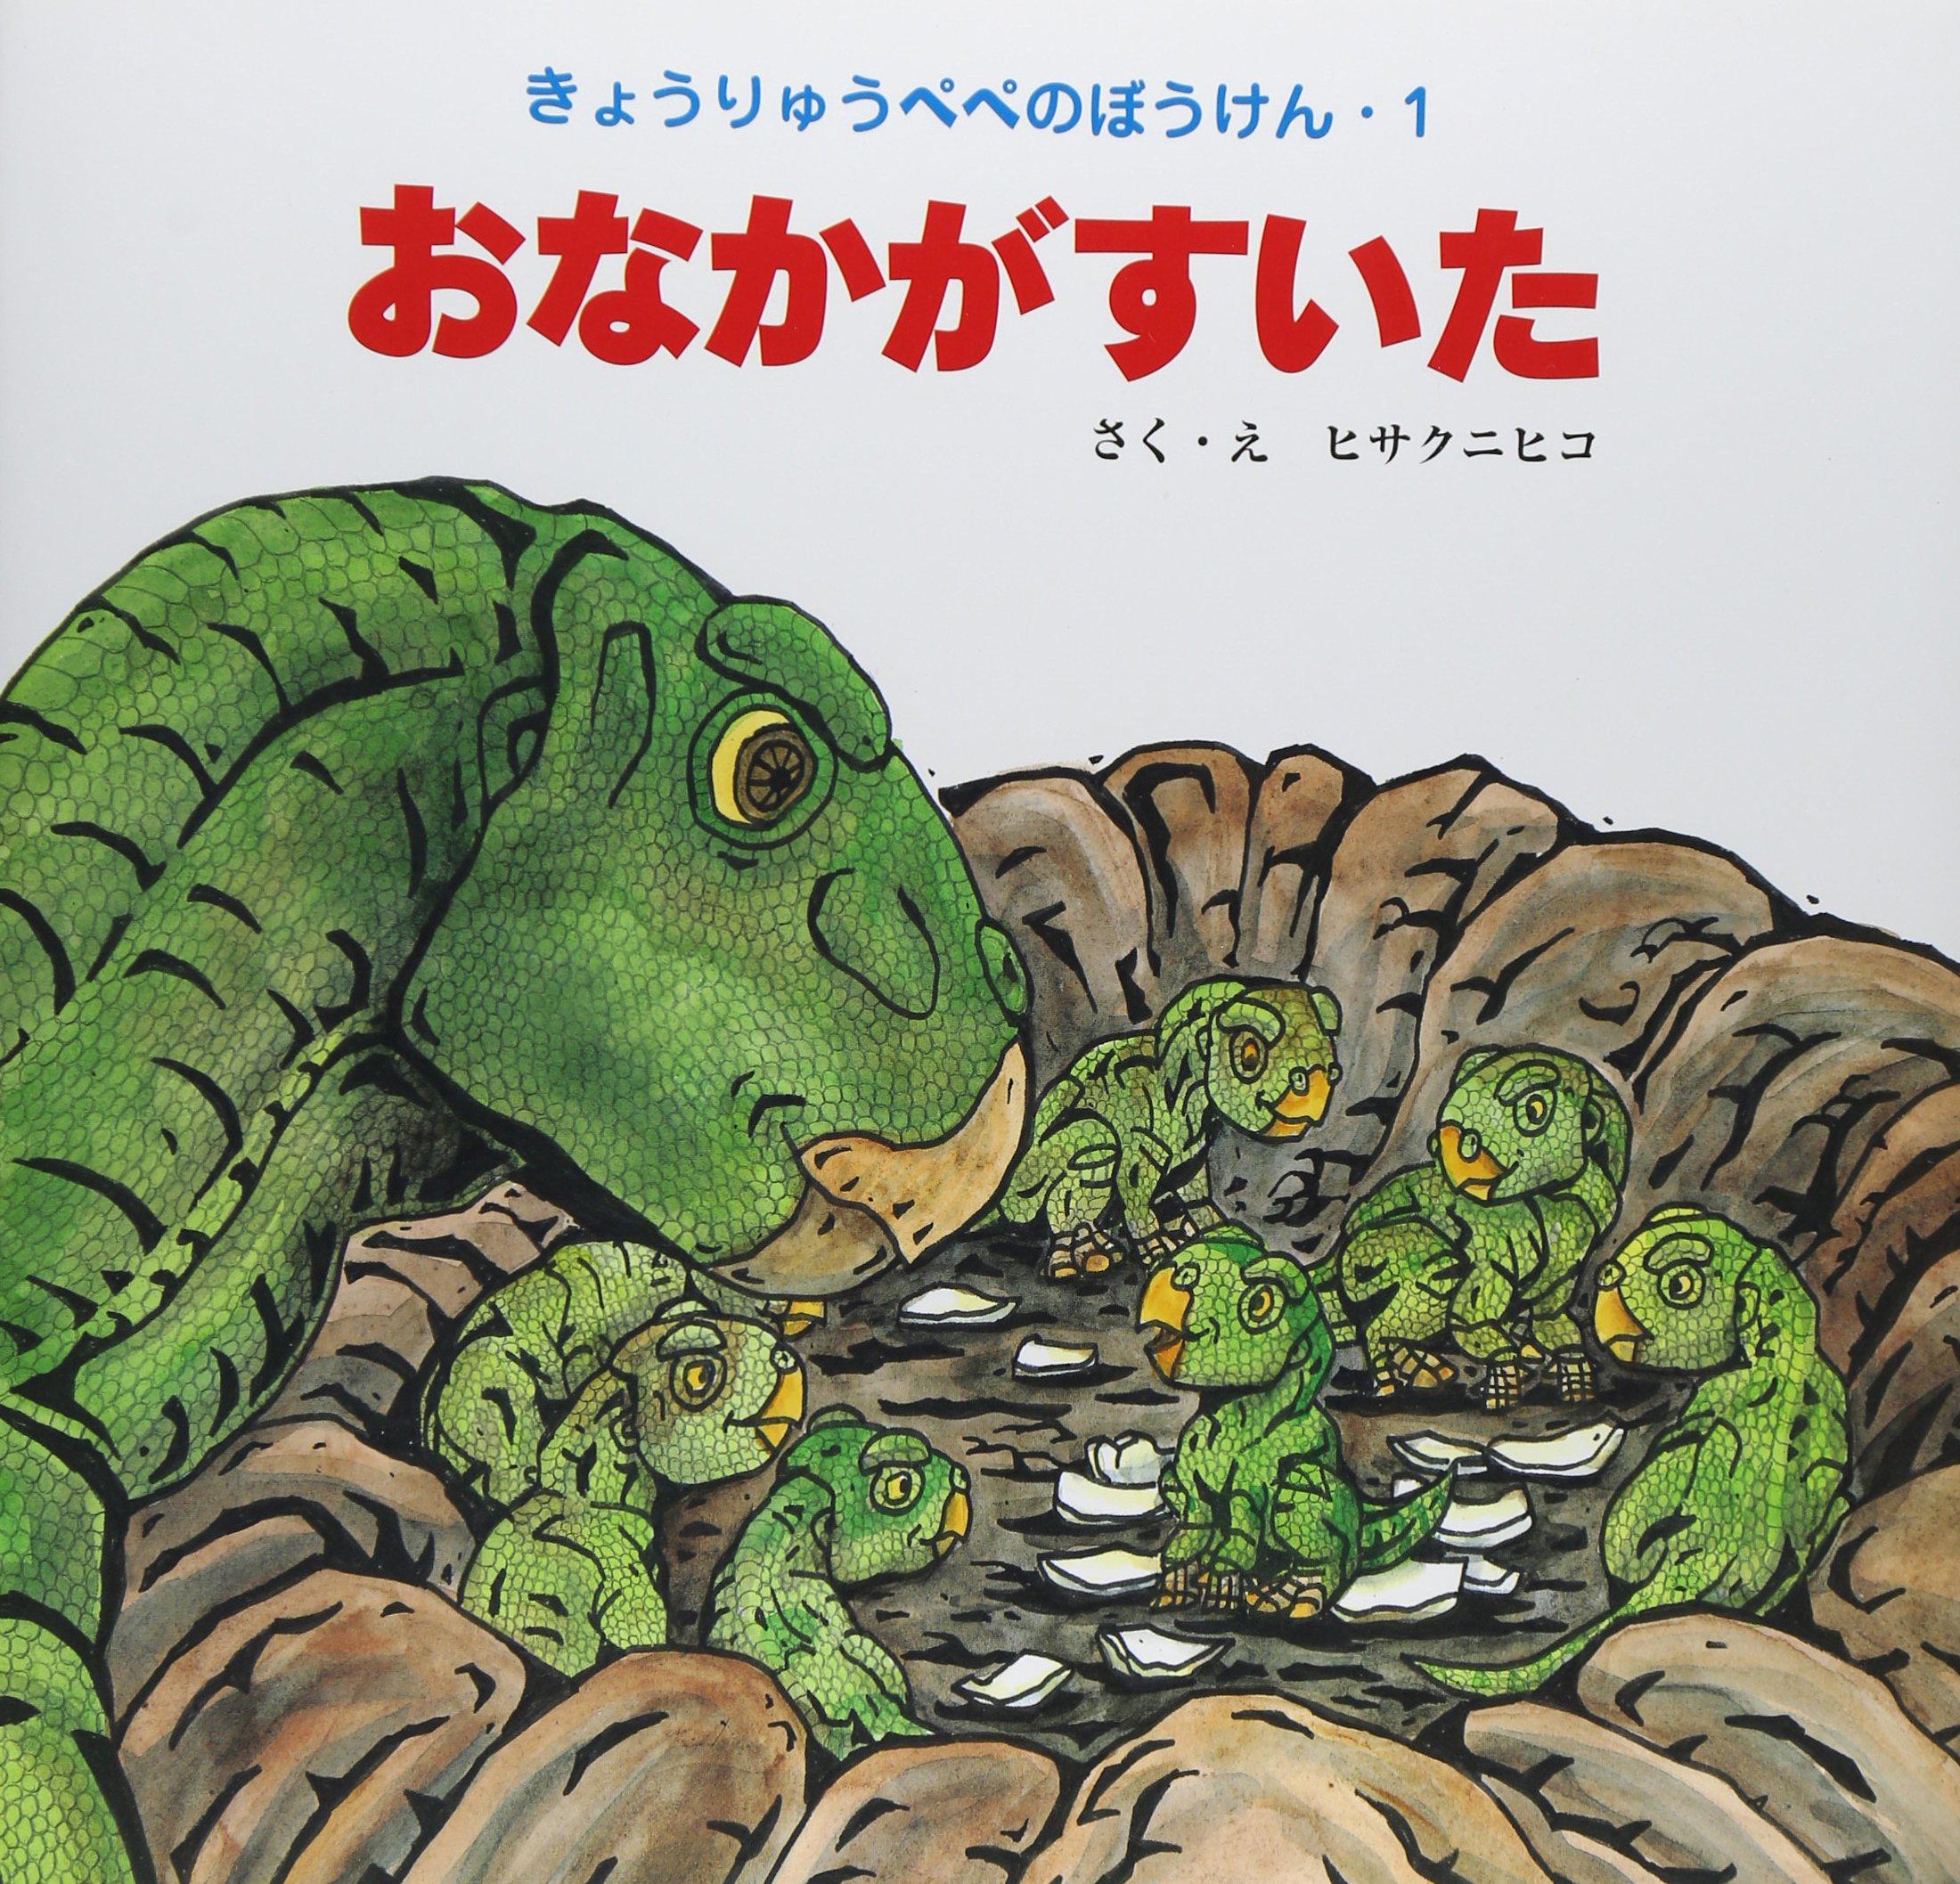 I M Hungry Adventure Dinosaur Pepe 1 Adventure Dinosaur Pepe 1 2006 Isbn 4882642506 Japanese Import 9784882642503 Amazon Com Books